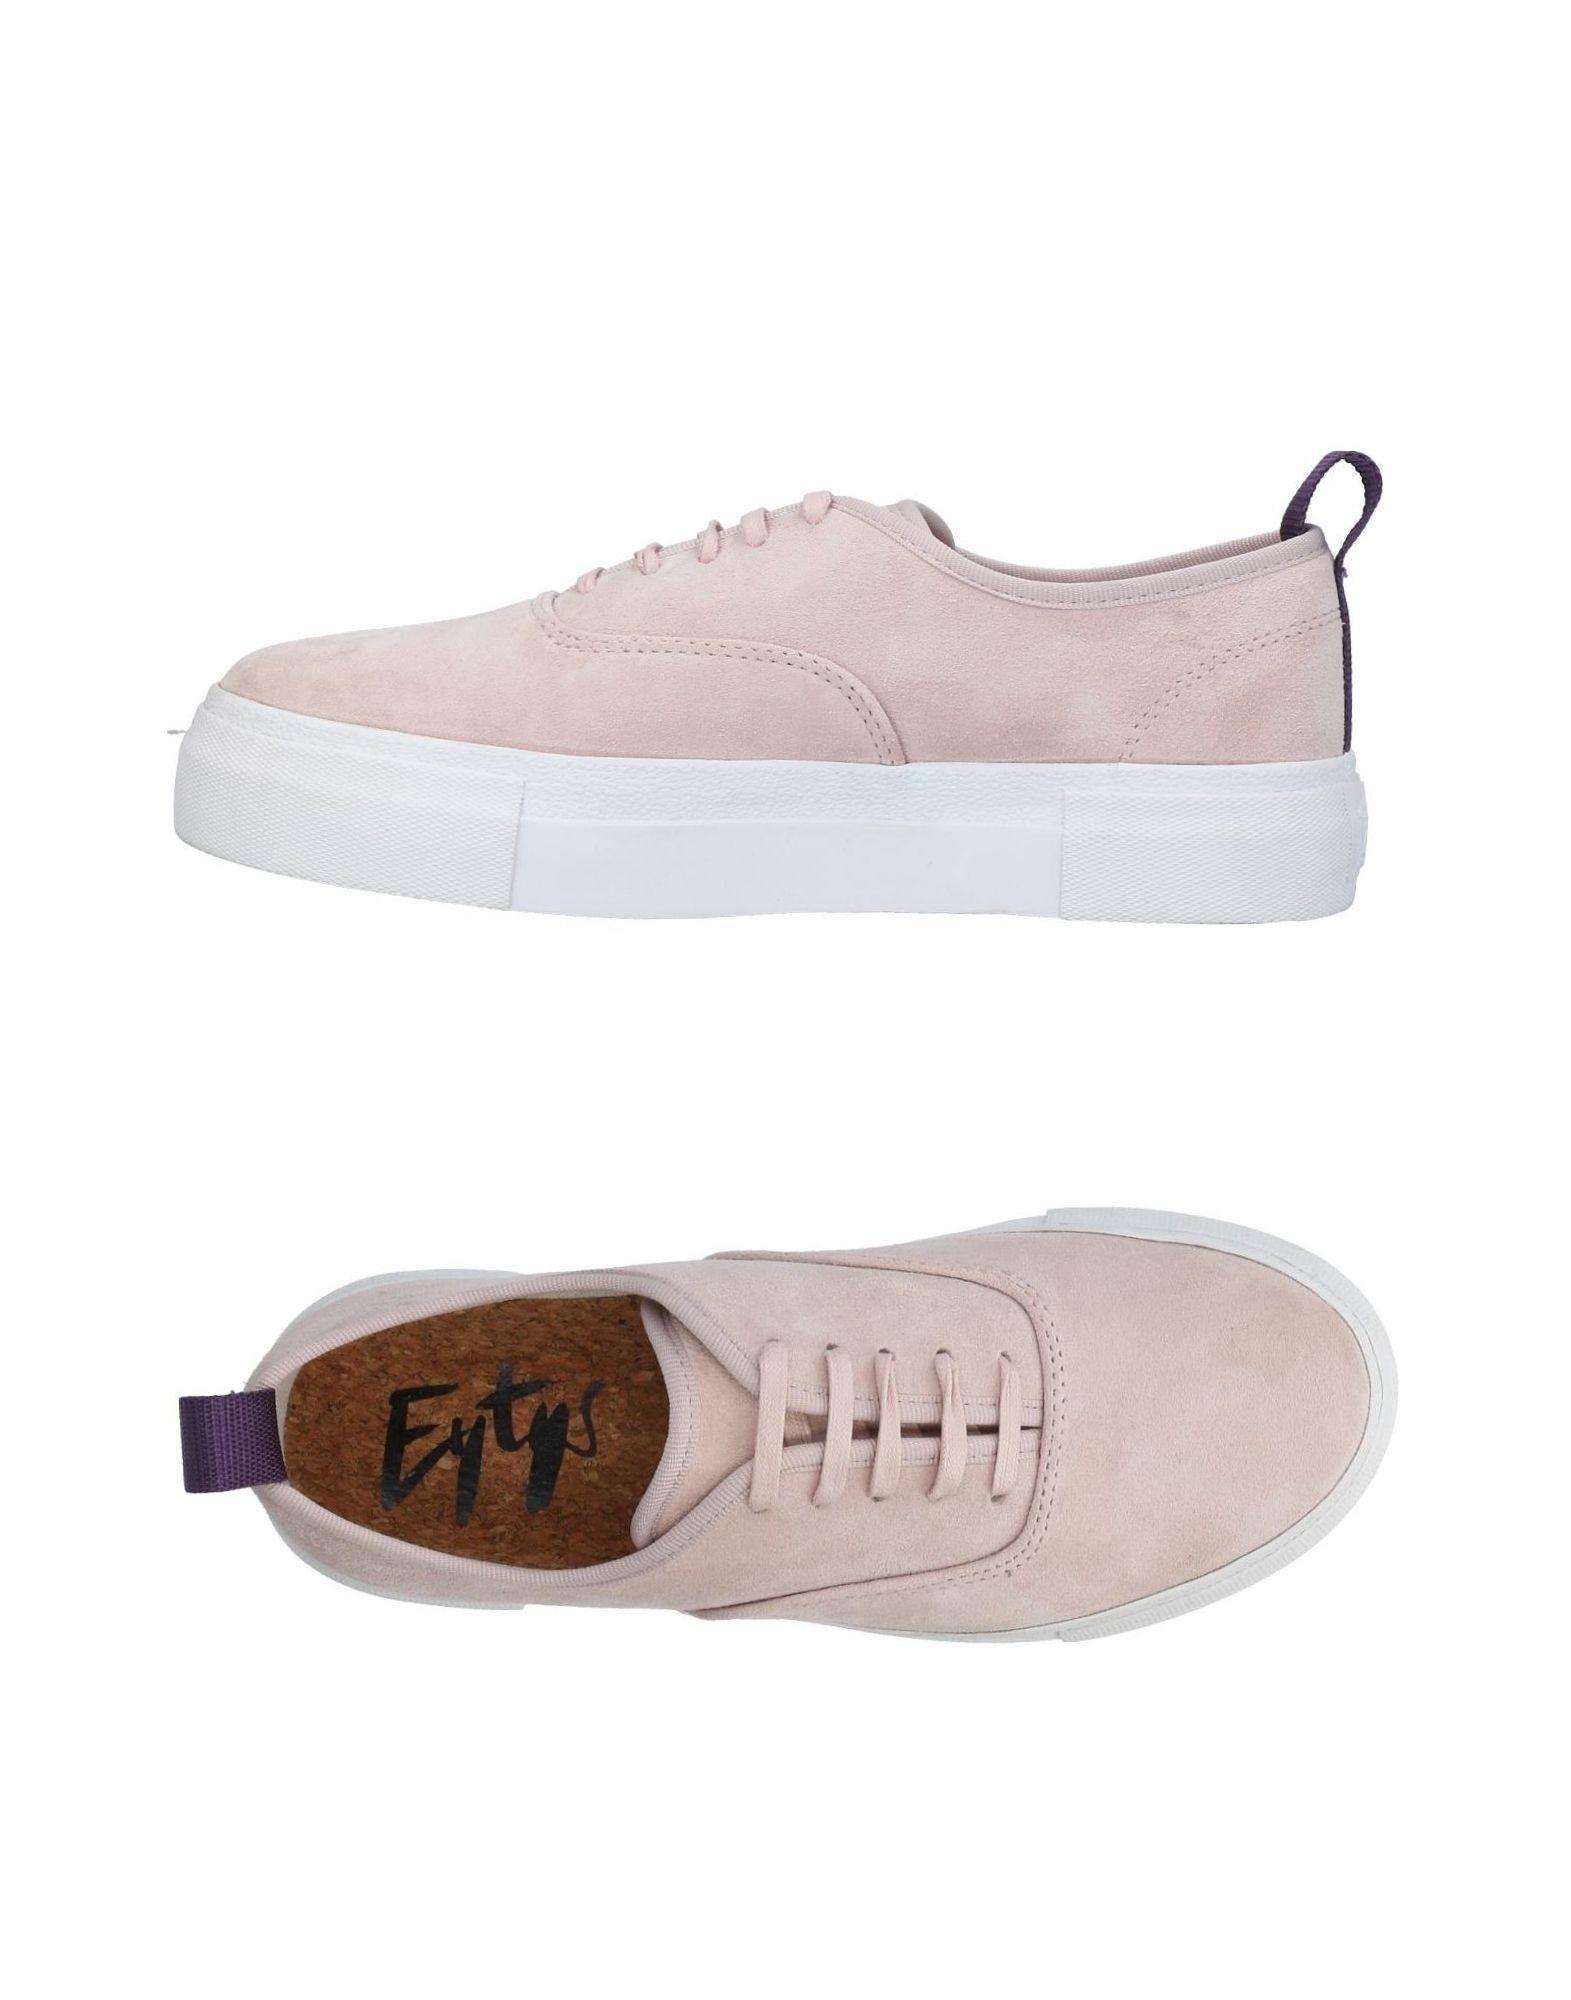 Eytys Gute Sneakers Damen  11422456GX Gute Eytys Qualität beliebte Schuhe b32881